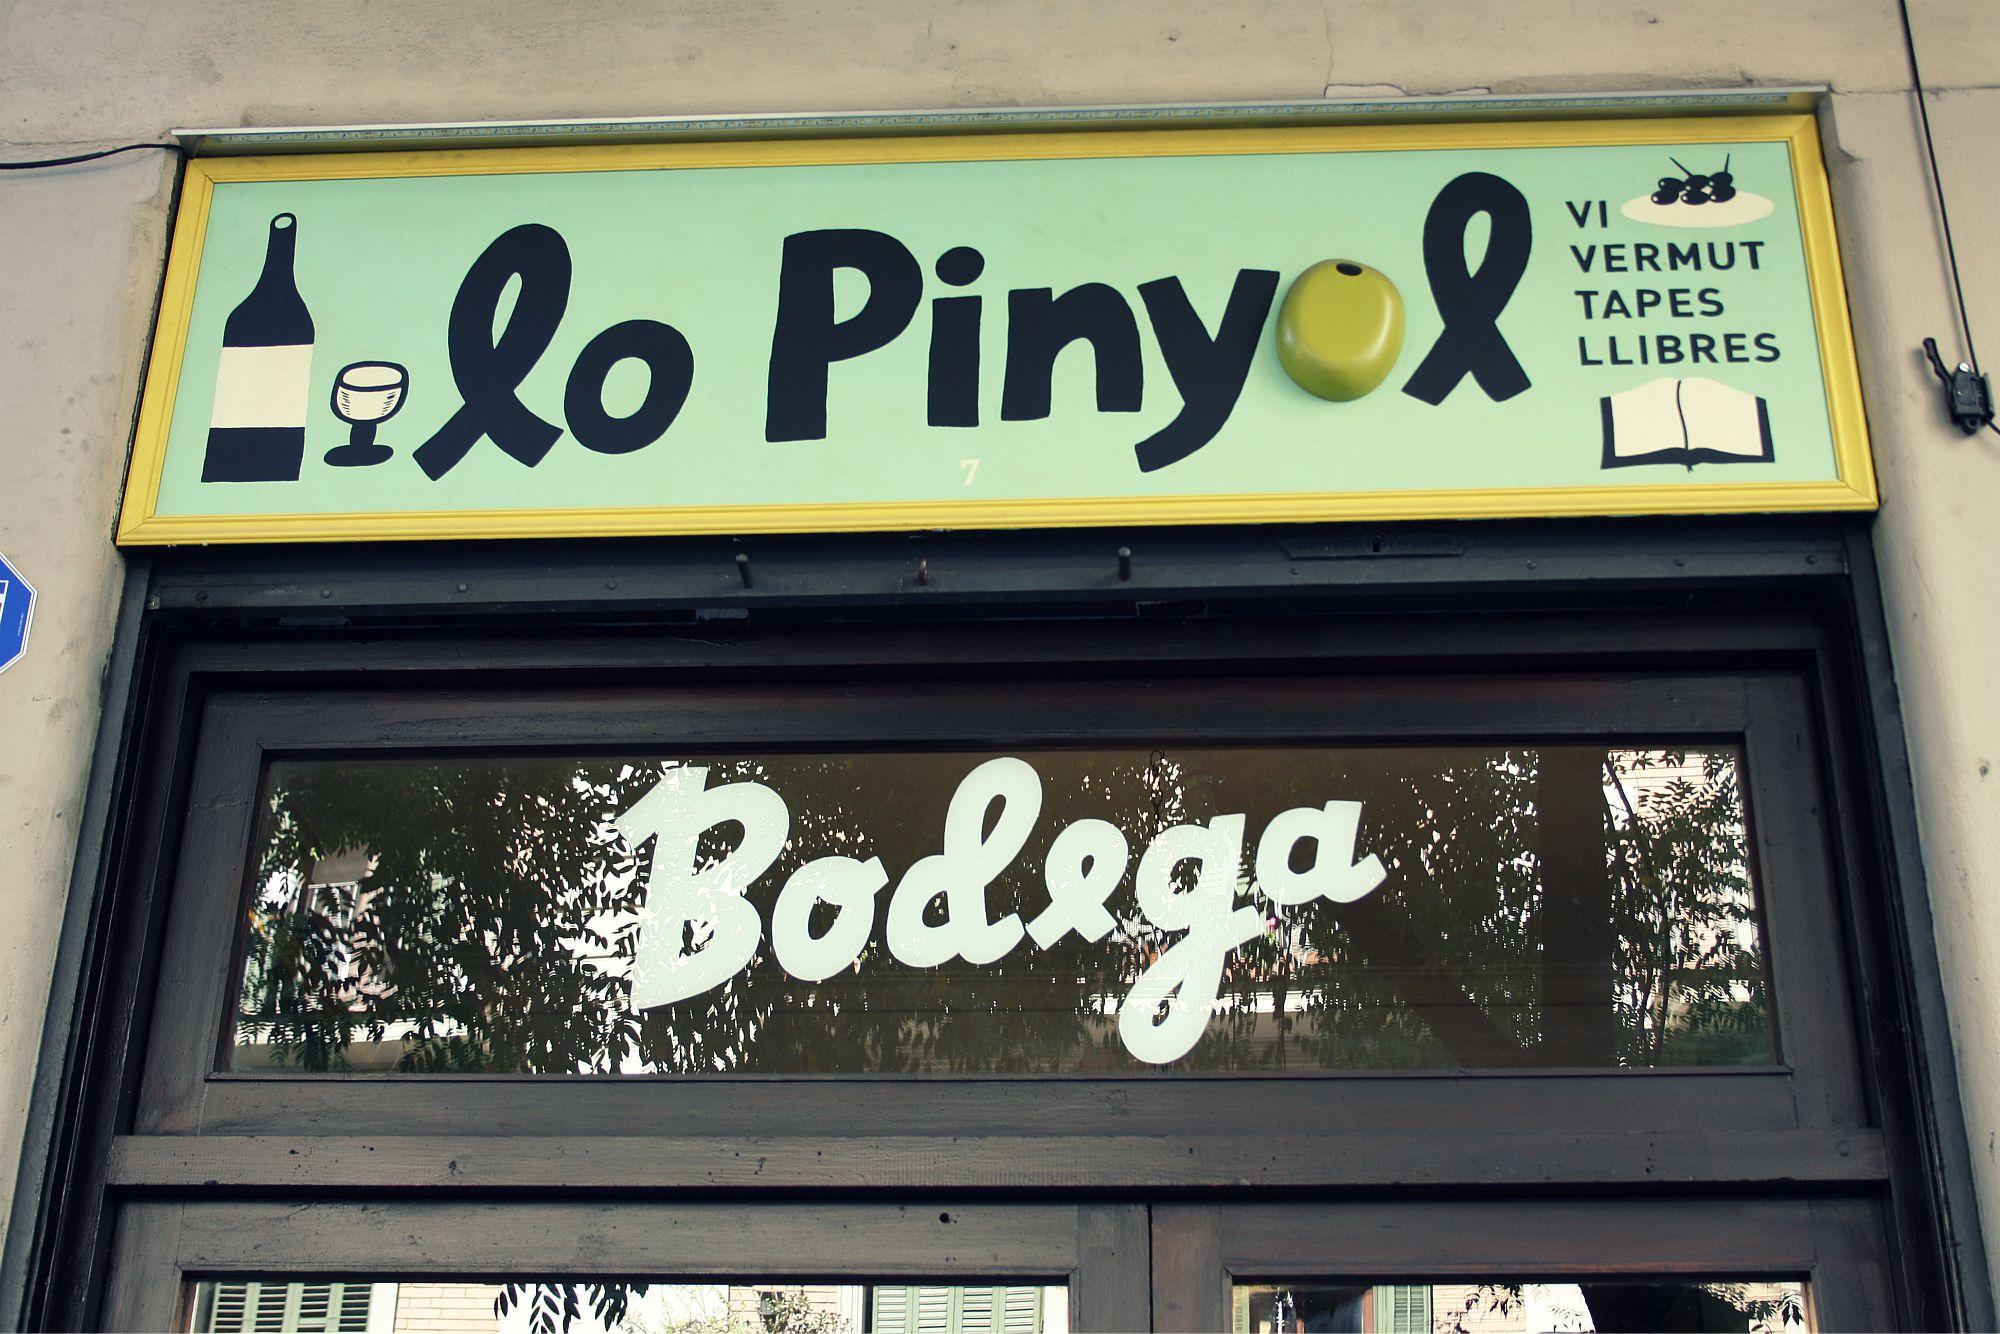 Cartel de Bodega Lo Piñol